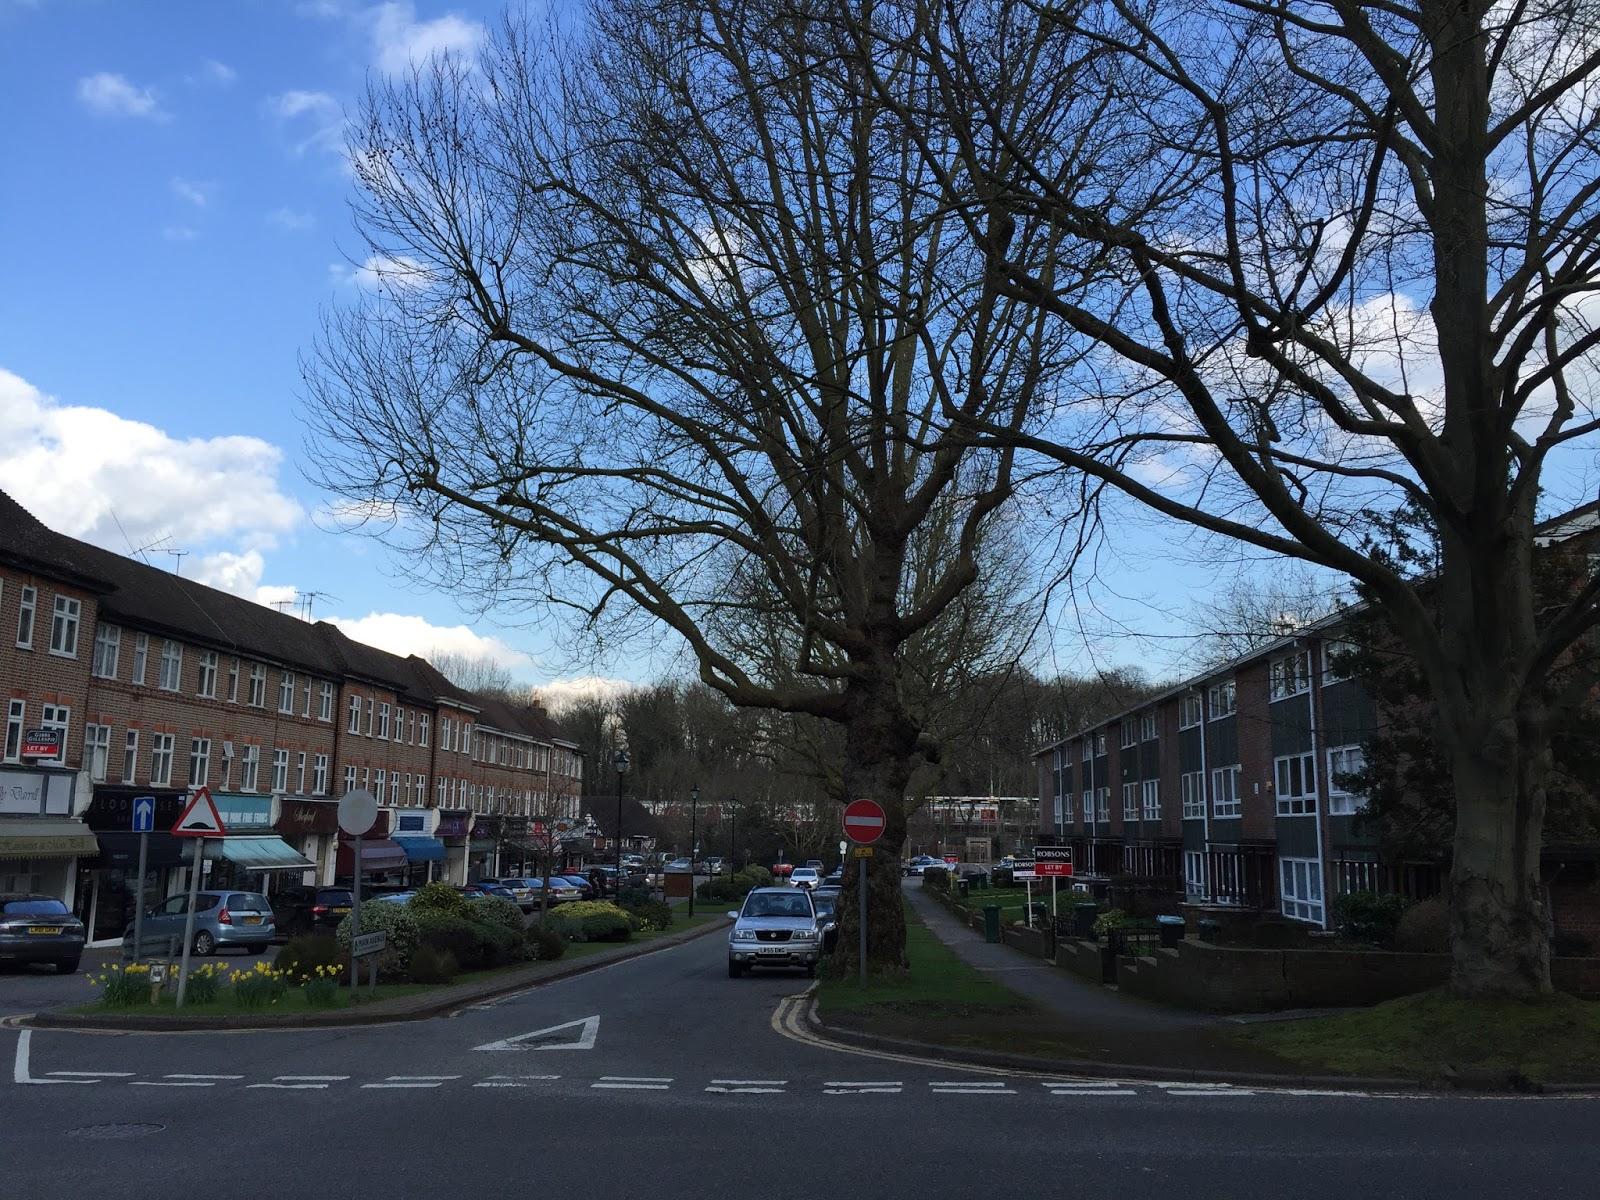 Shop parade and flats, Moor Park